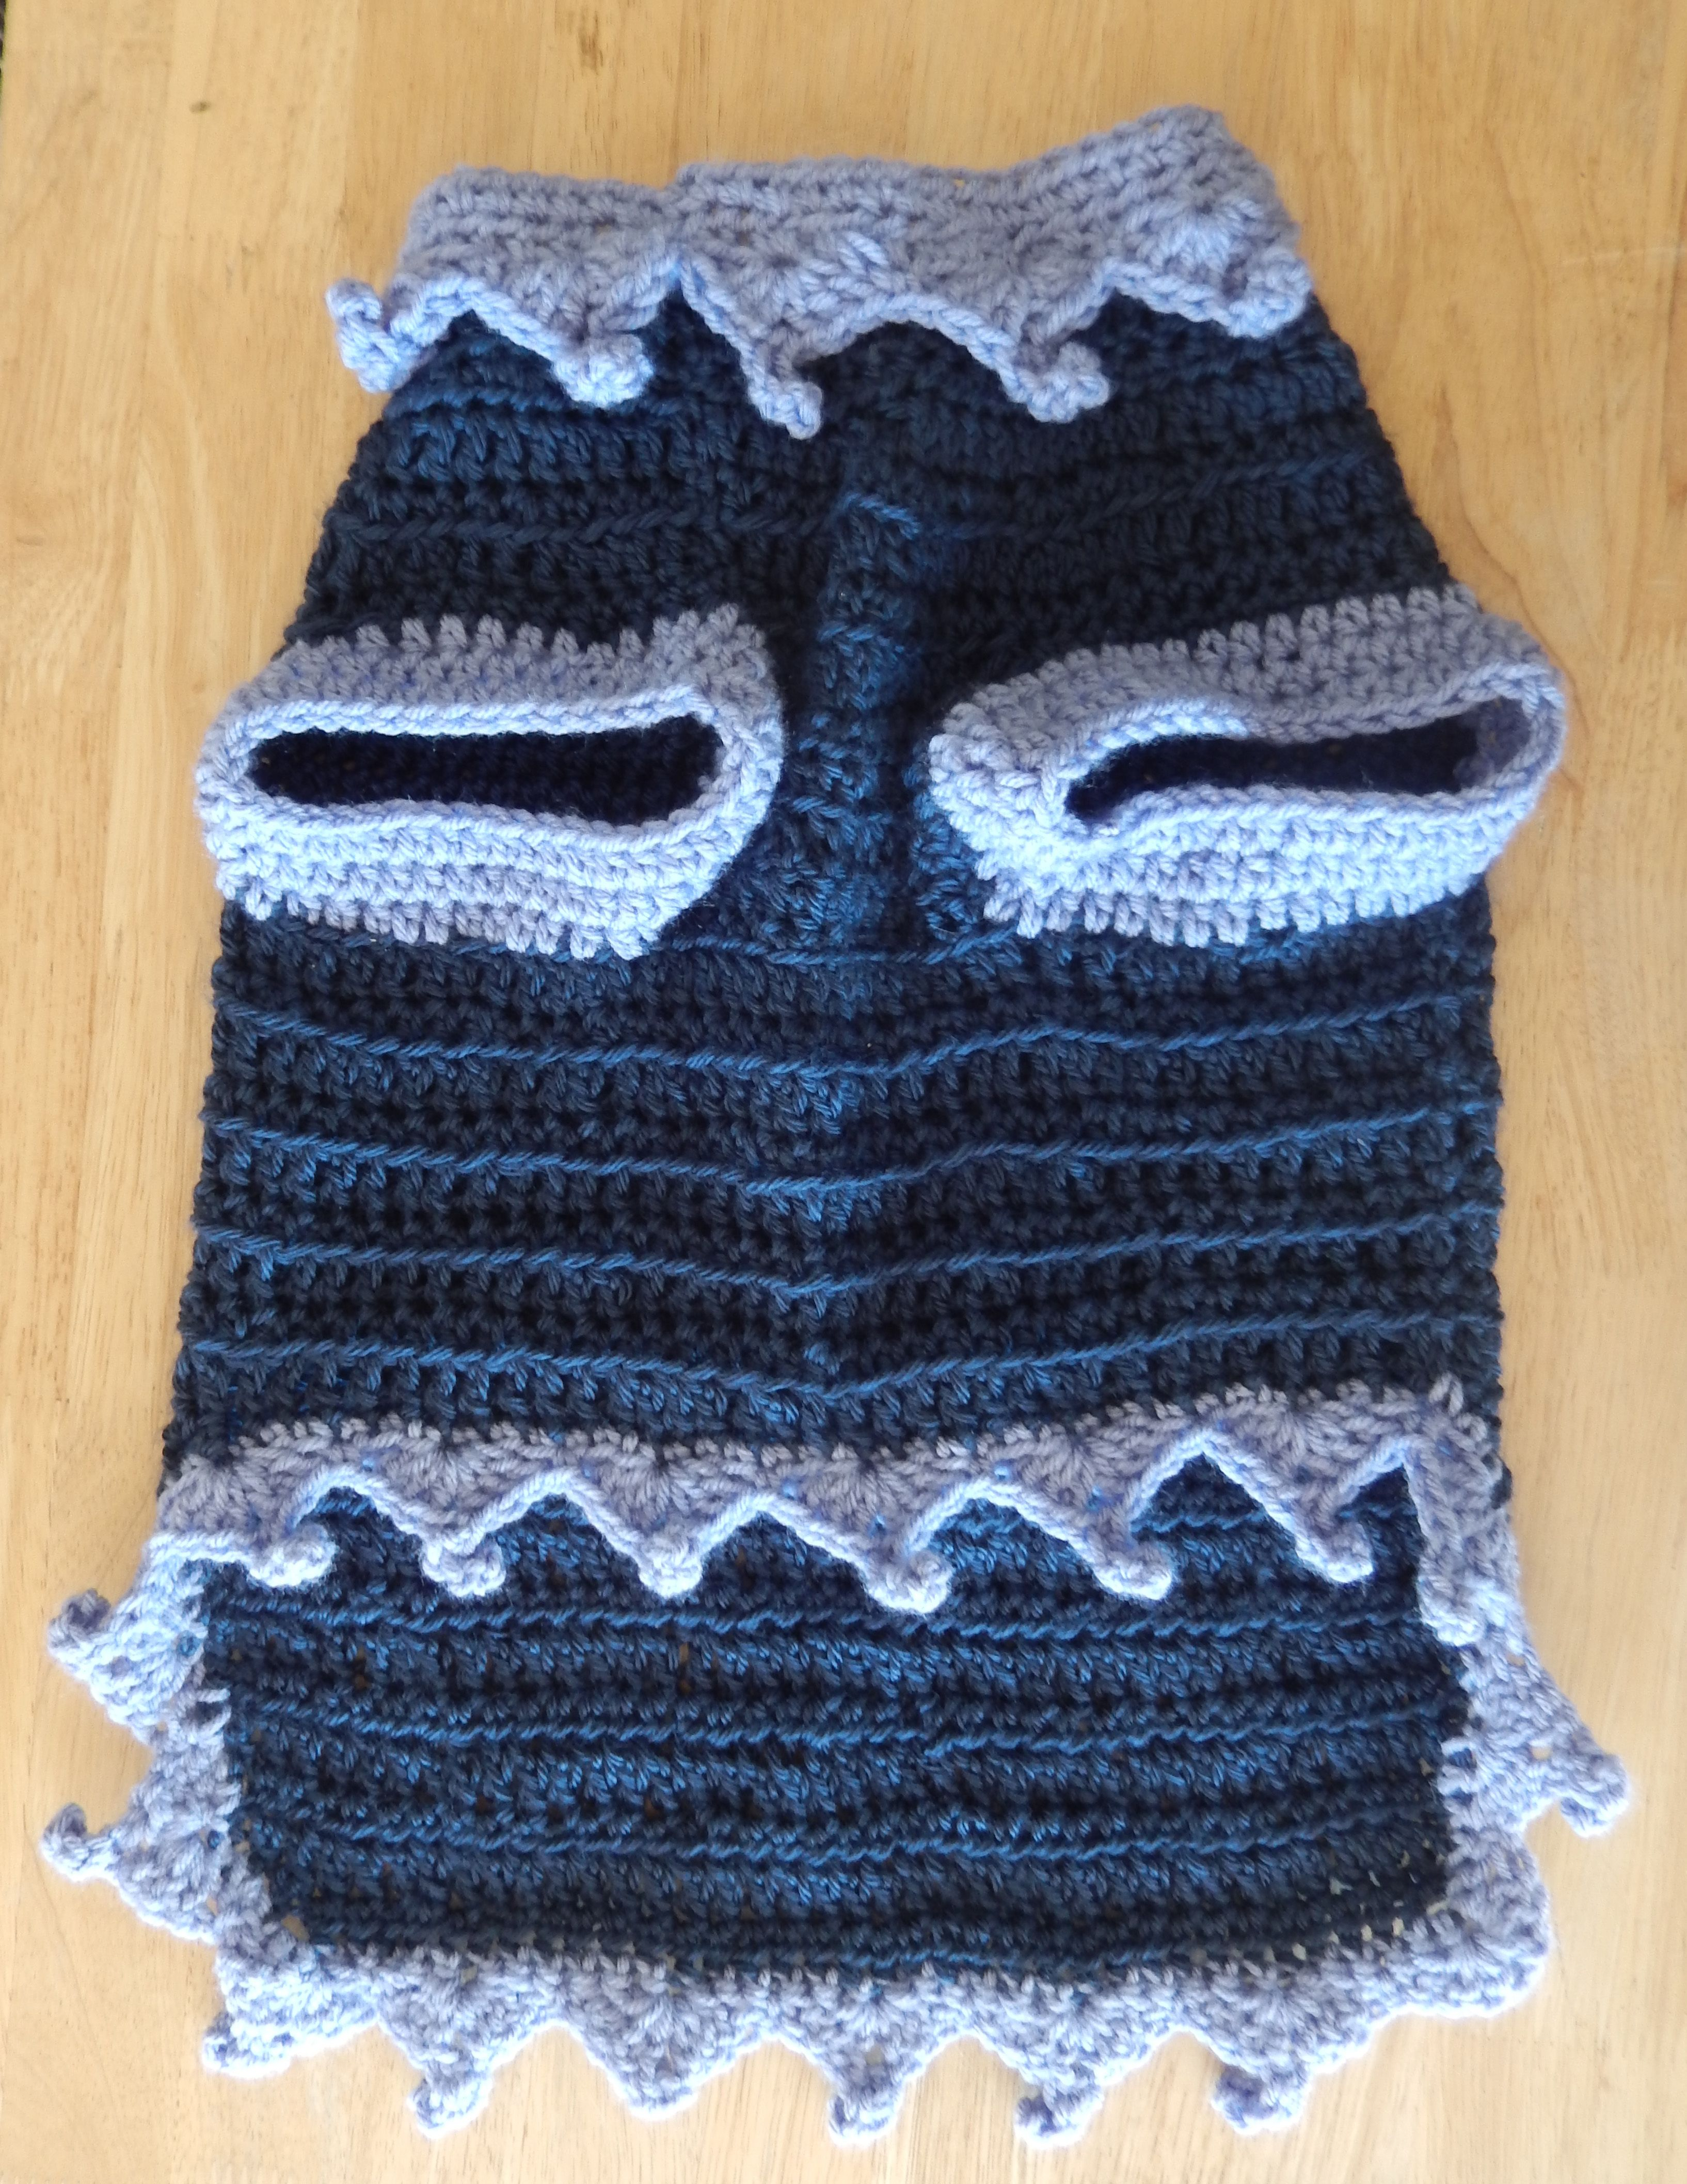 Crochet Dog Sweater | crochet | Pinterest | Crochet dog sweater ...